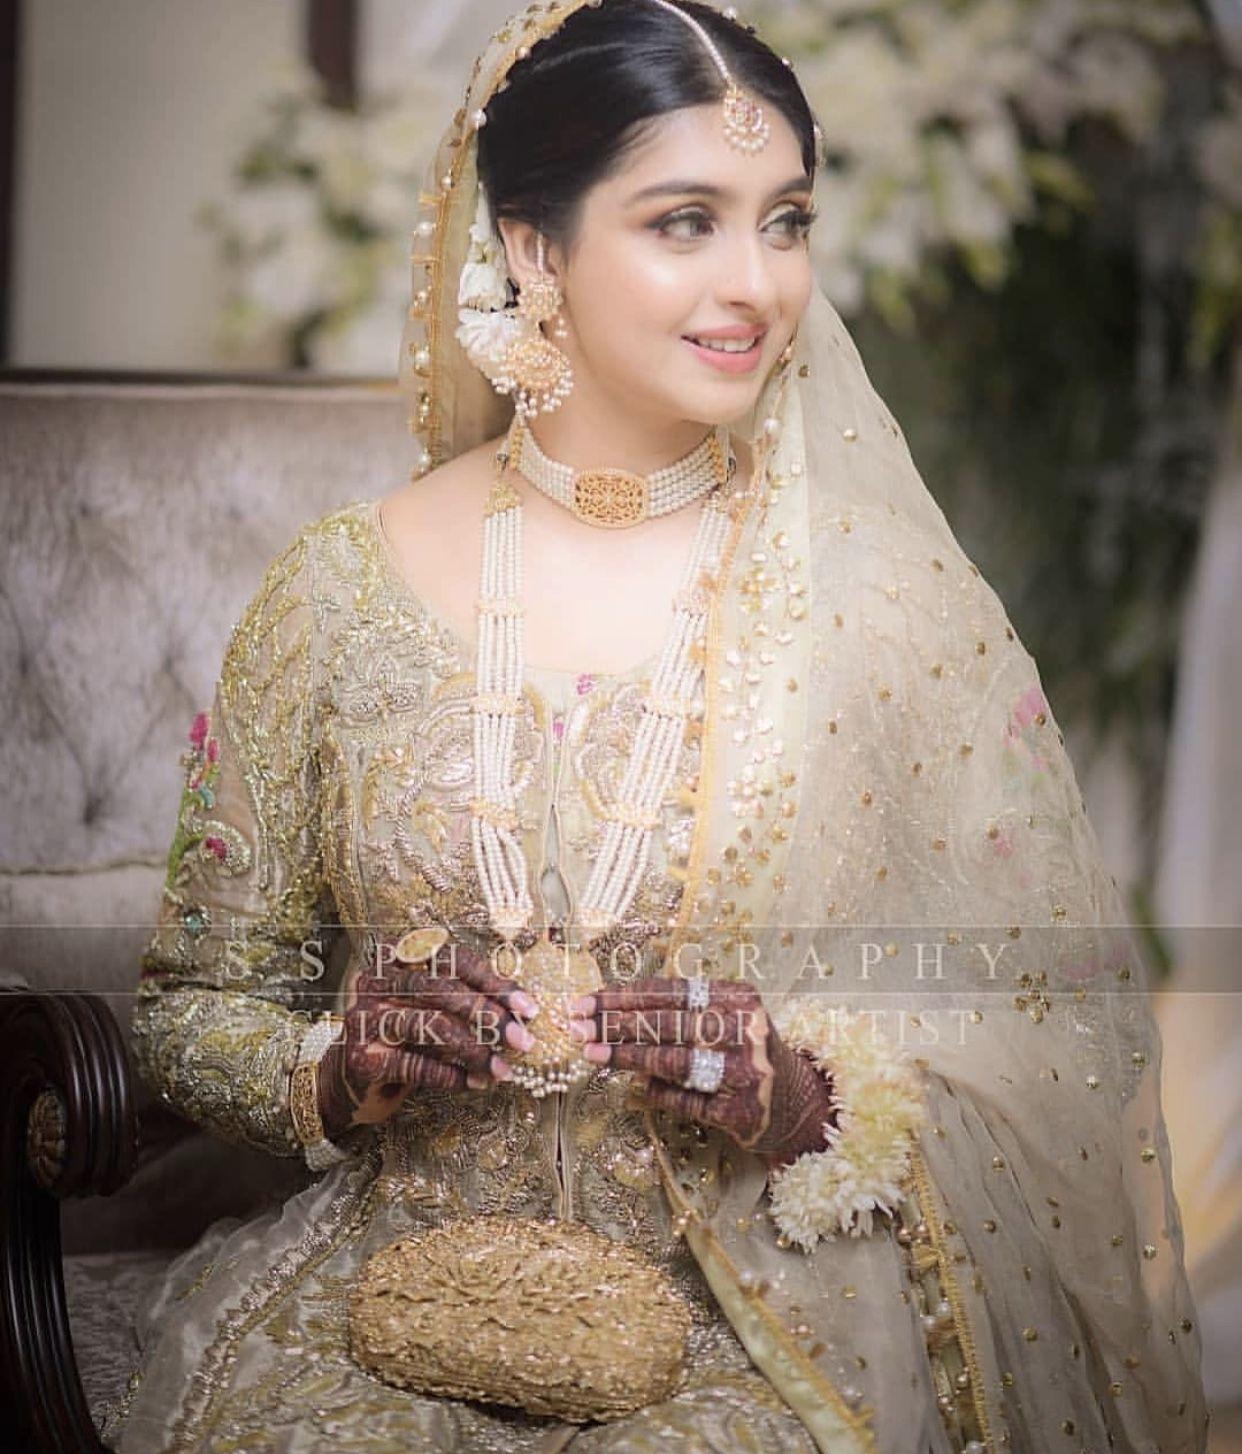 Hairstyle Girl Jora: Bridal Mehndi Dresses By Shikha Shivani On Bridal